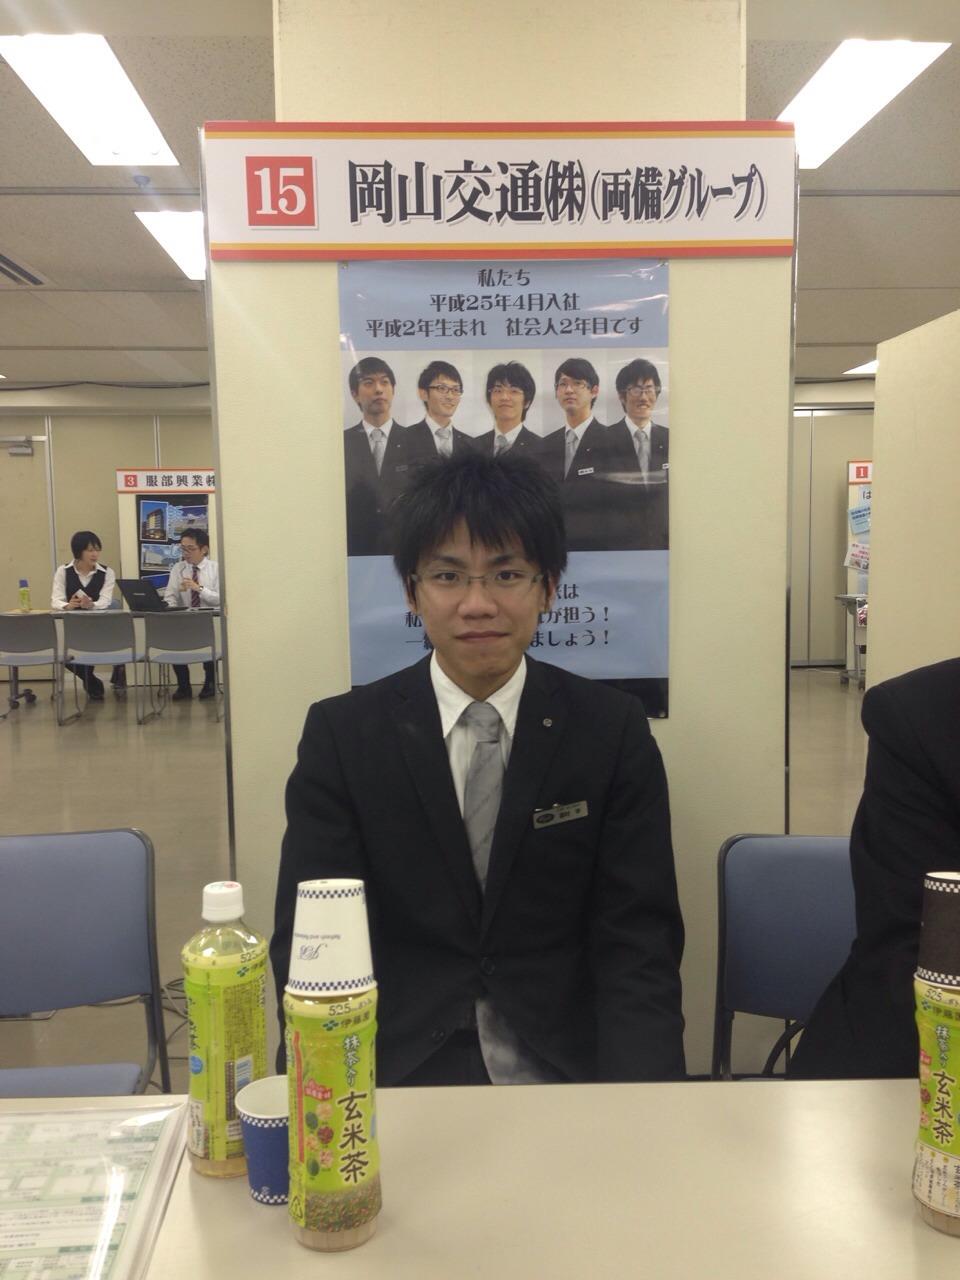 H 説明会藤村